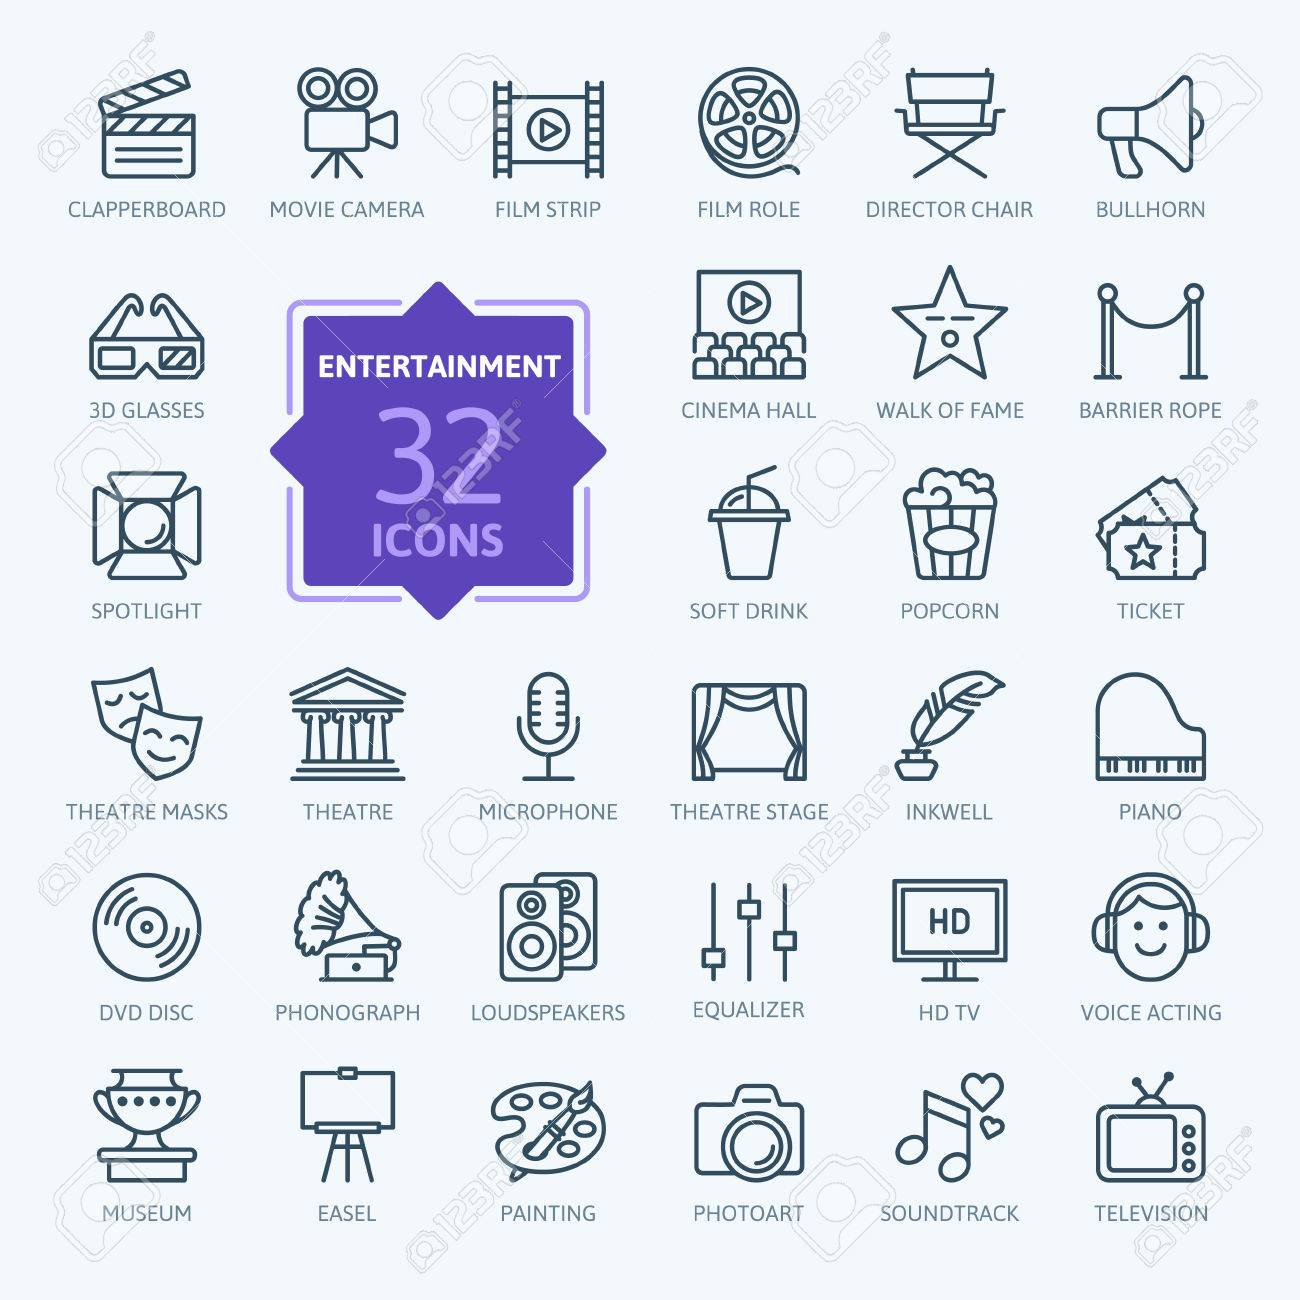 Entertainment icon set - outline icon collection, vector - 70793827